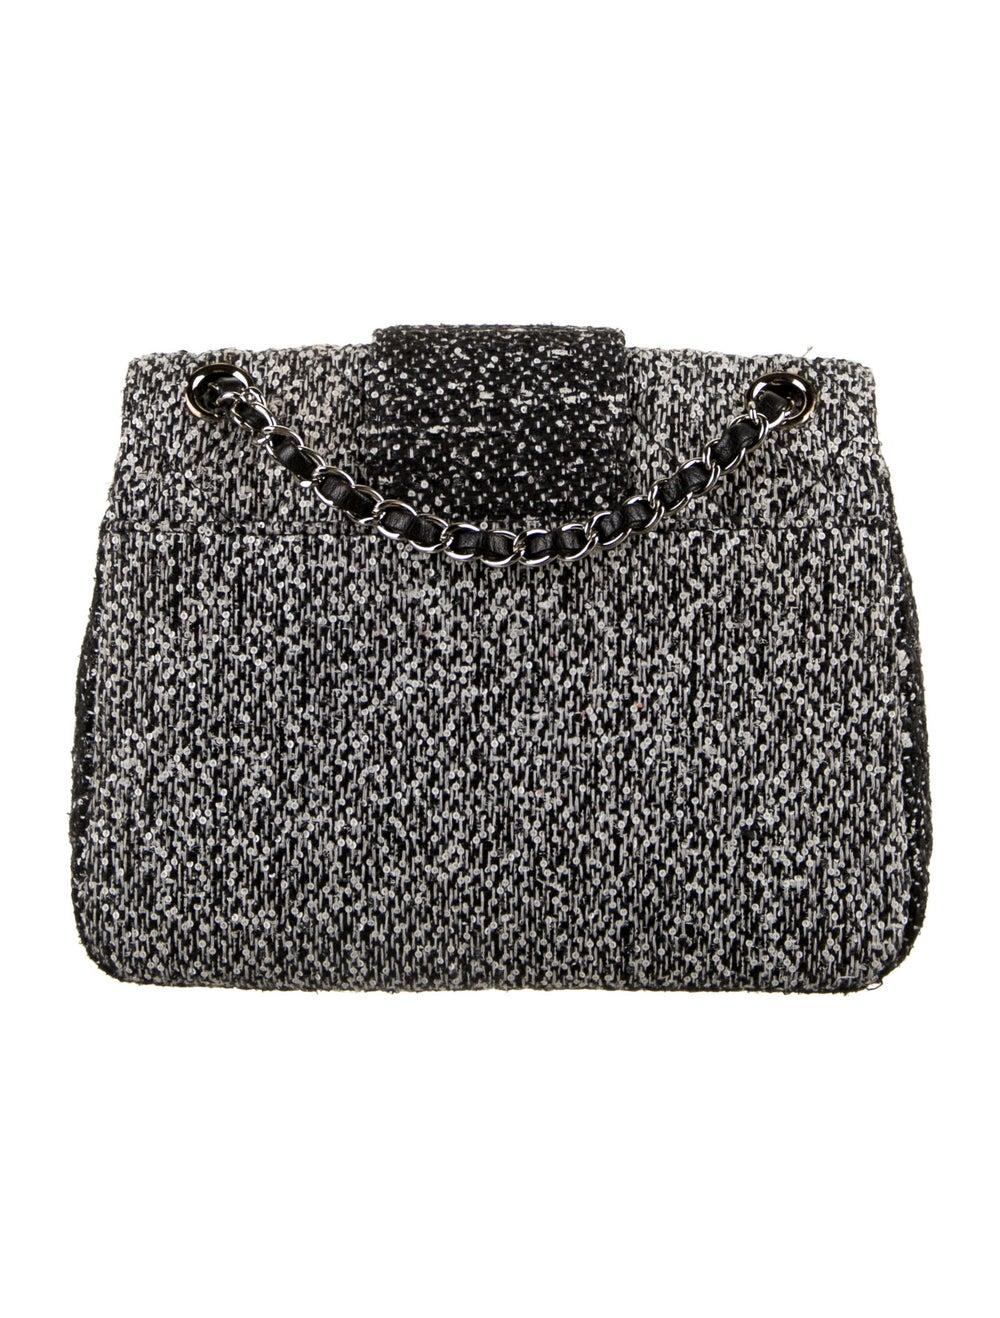 Chanel Tweed Elementary Chic Flap Bag Black - image 4